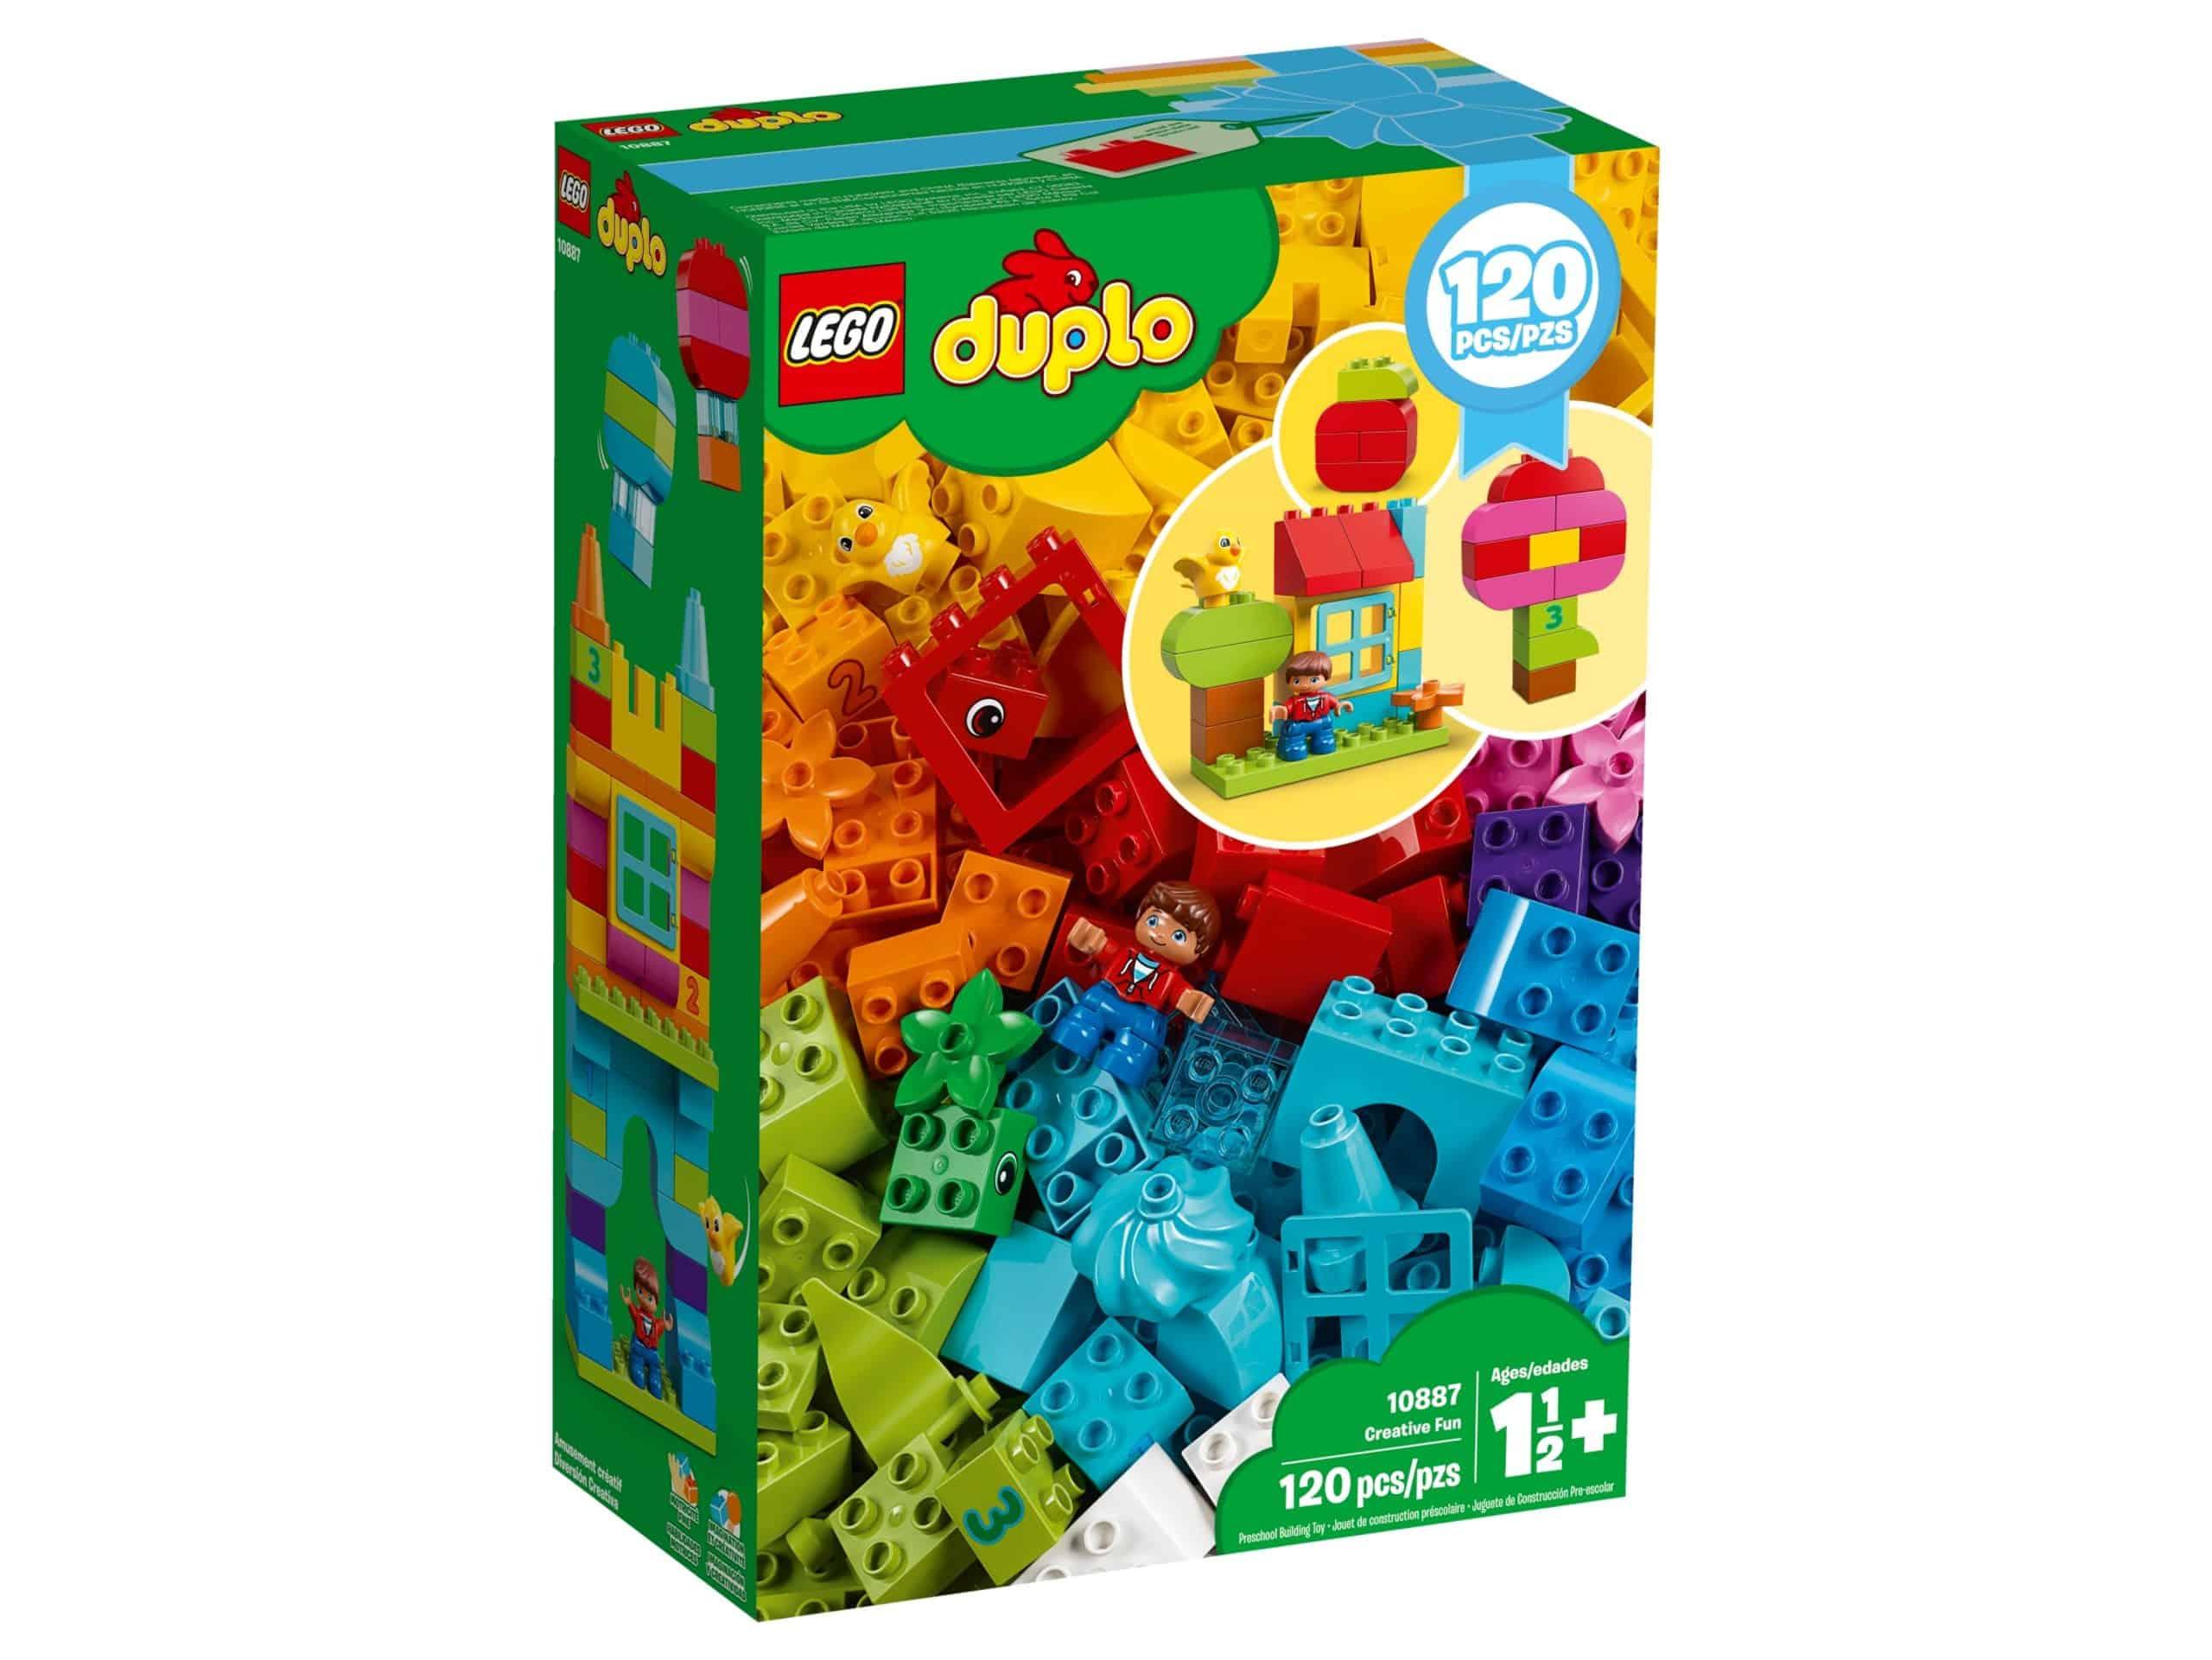 lego 10887 creative fun scaled